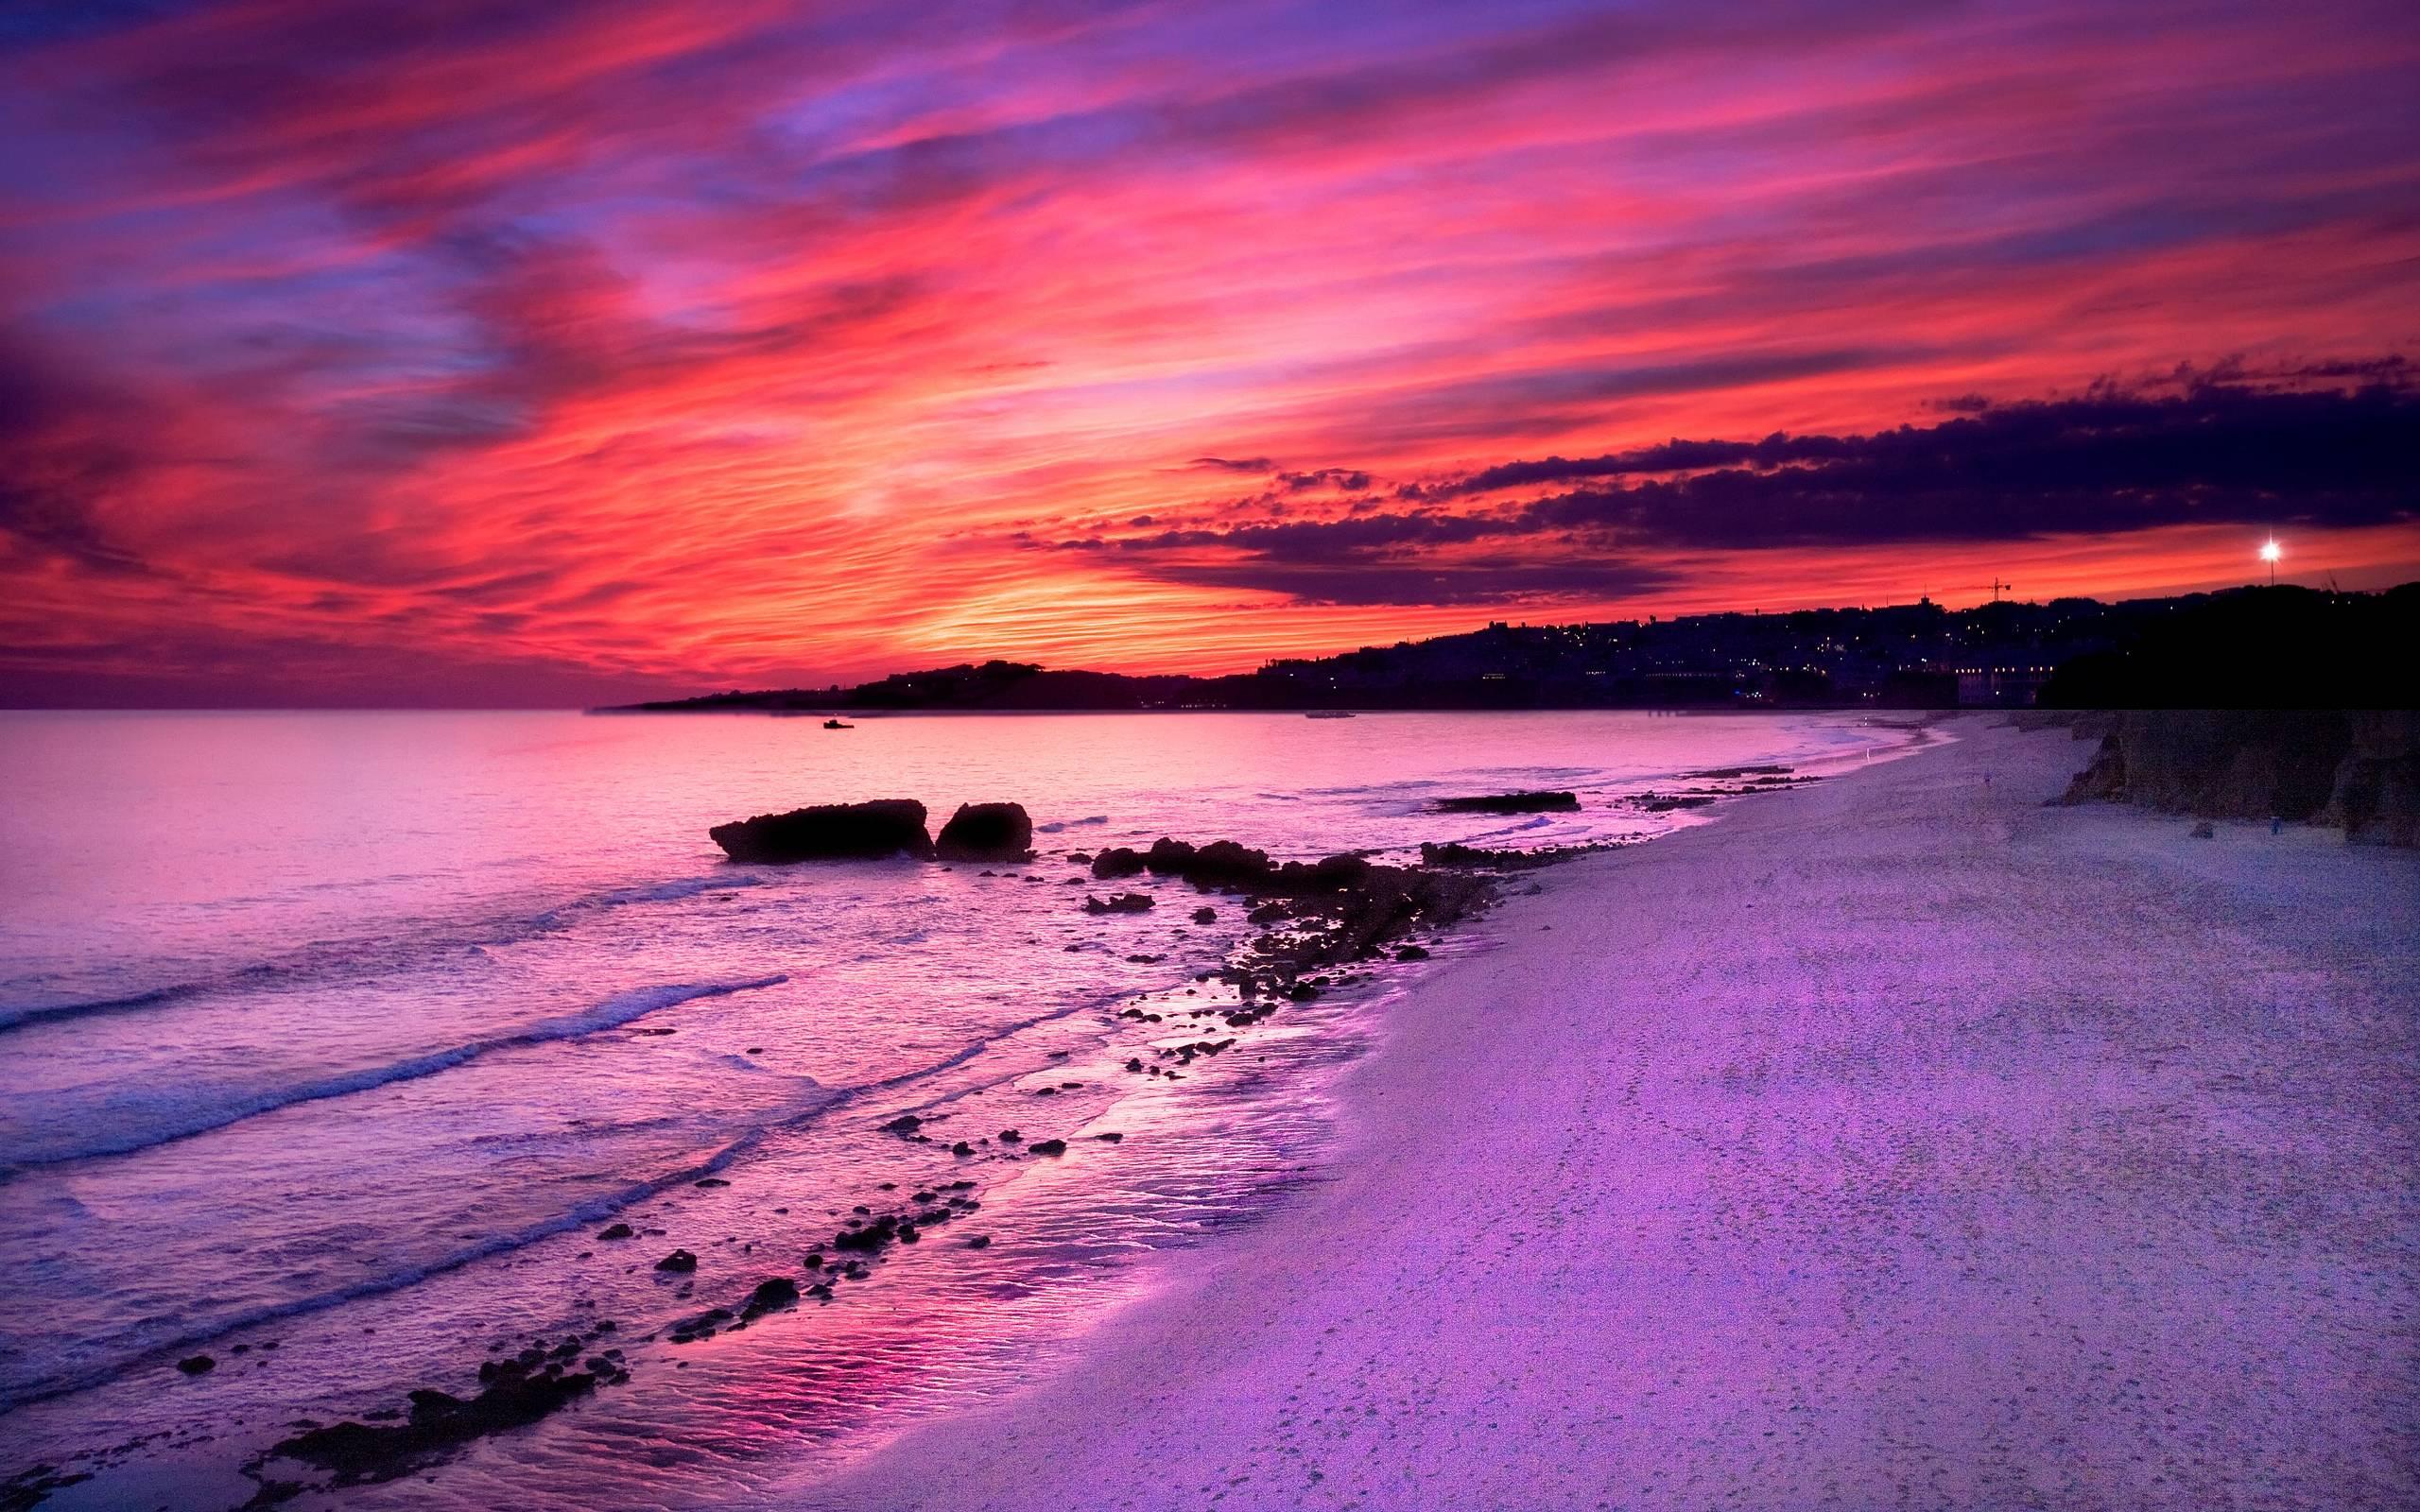 Eruption Creates Colorful U.S. Sunsets